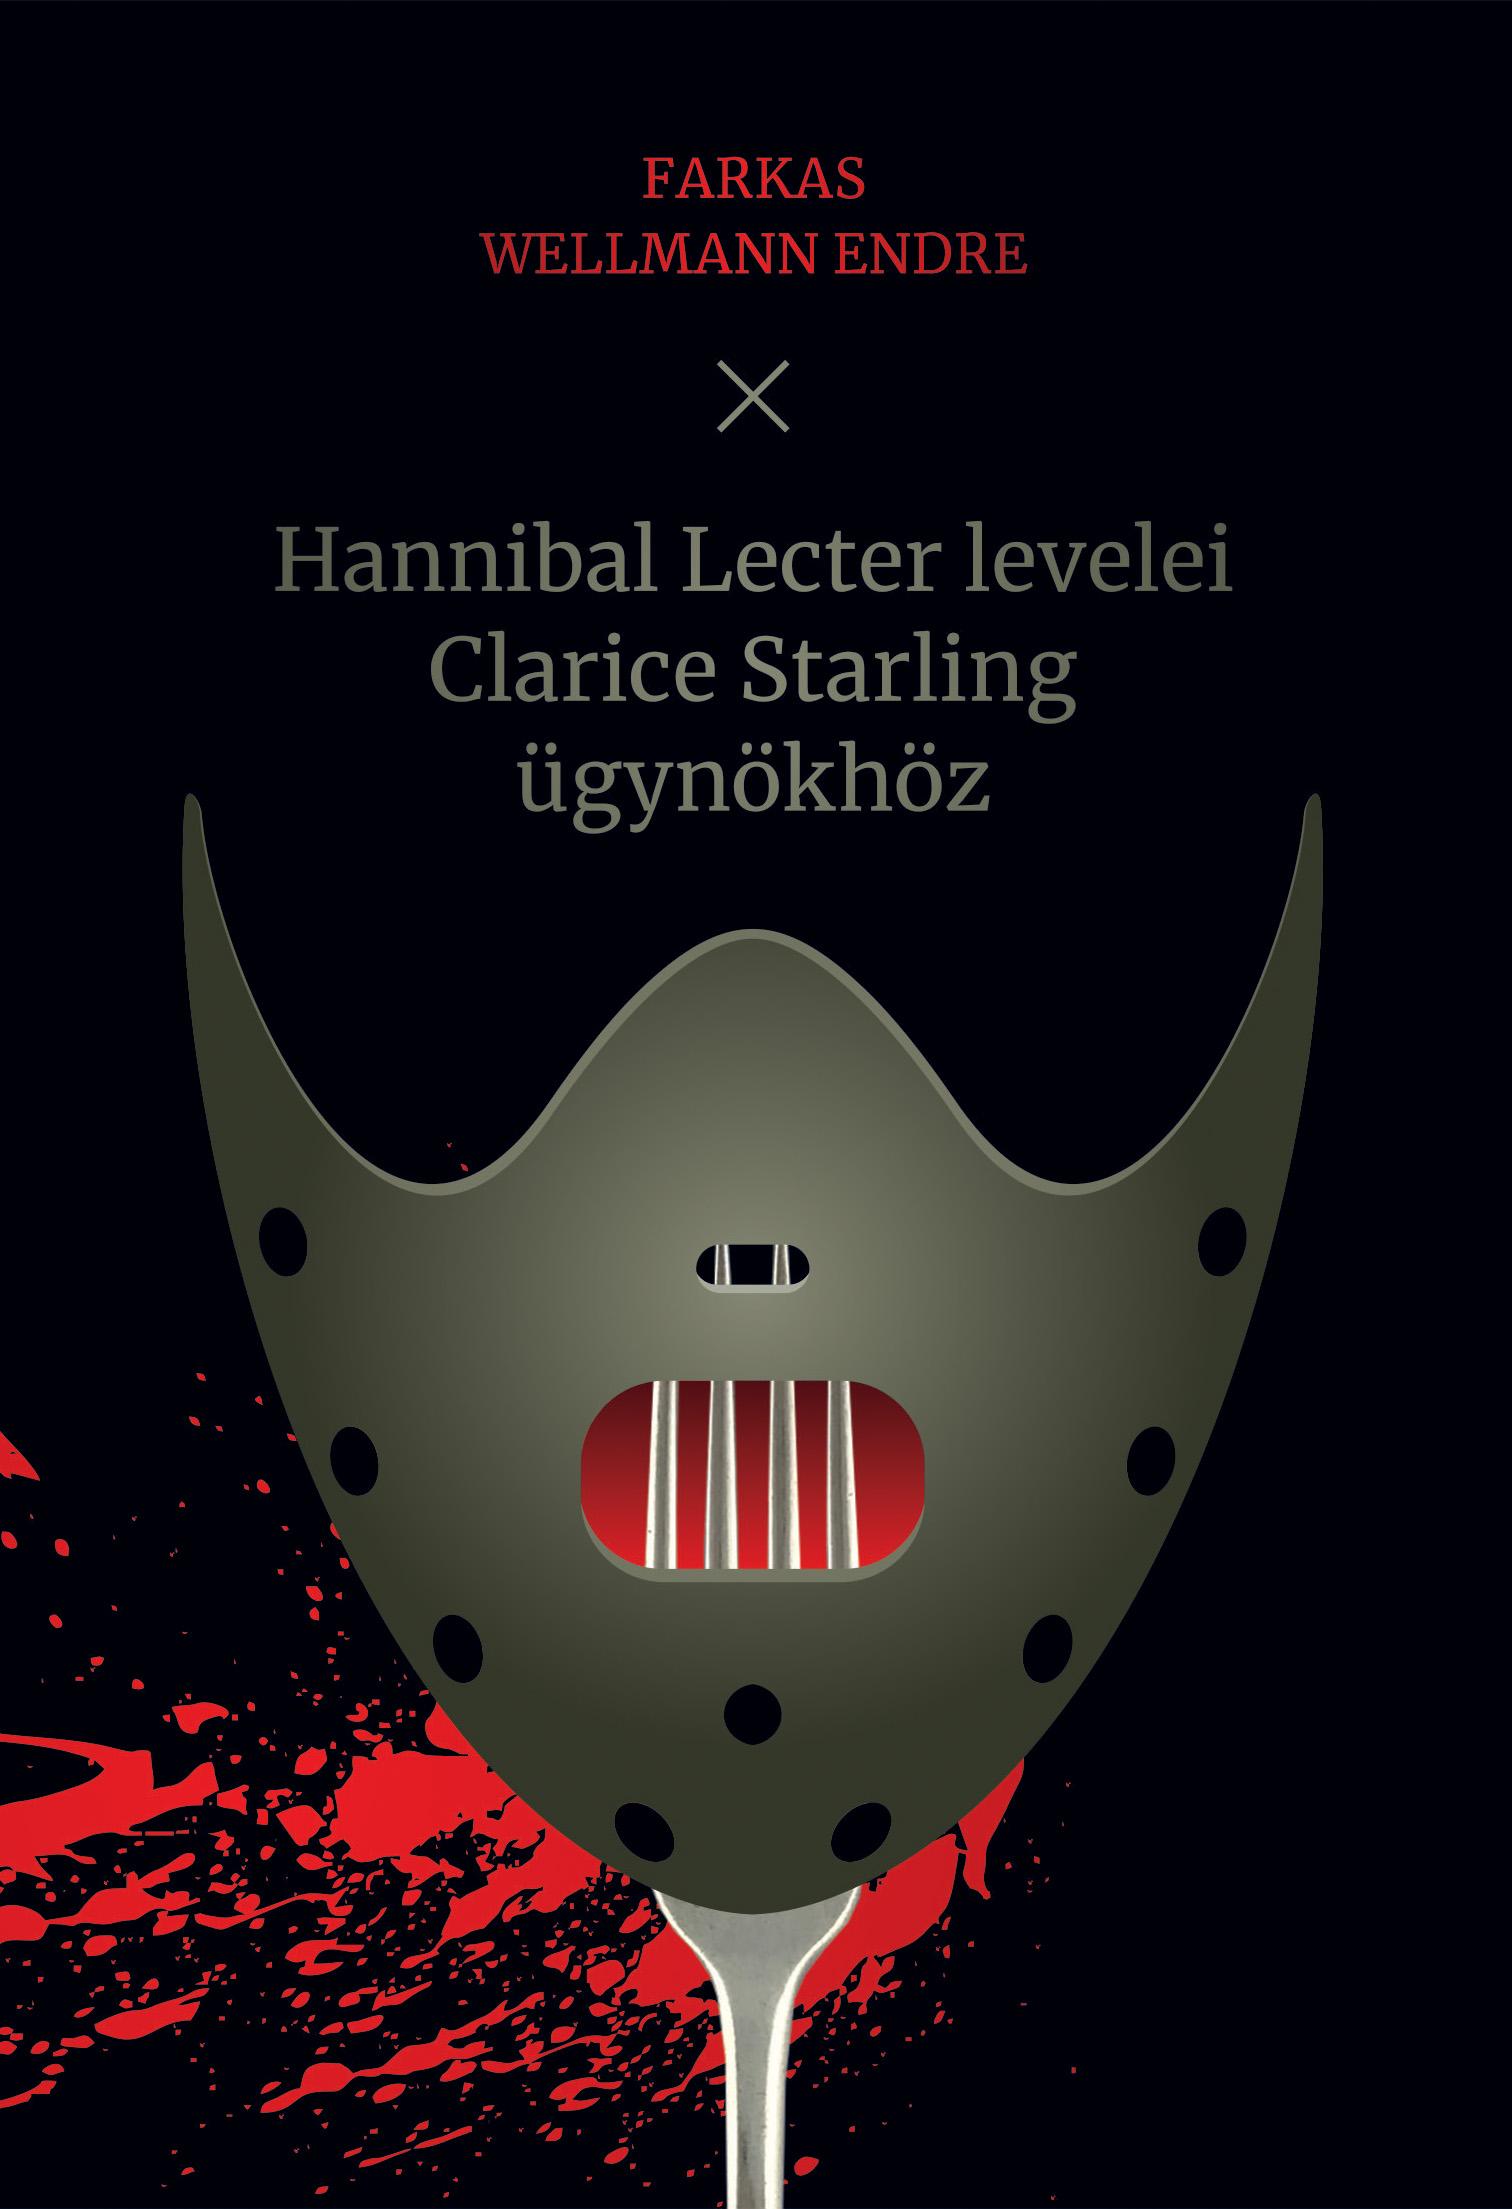 Hannibal Lecter levelei Clarice Starling ügynökhöz